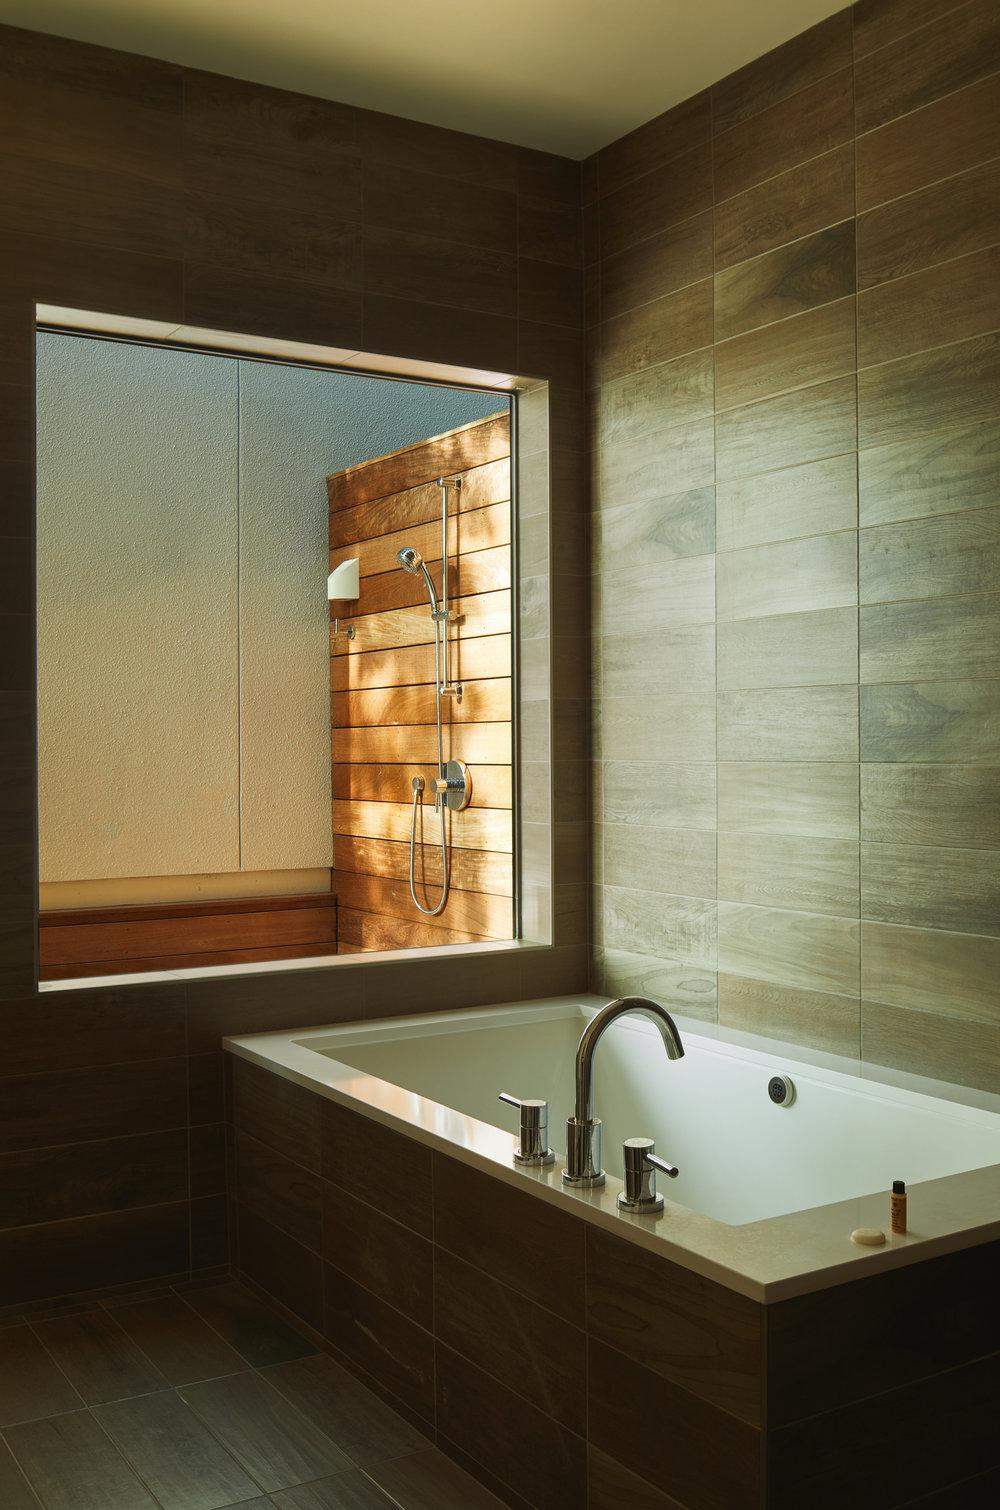 22 Via Media Residence by Matt Fajkus Architecture. Photography by Leonid_Furmansky.jpg